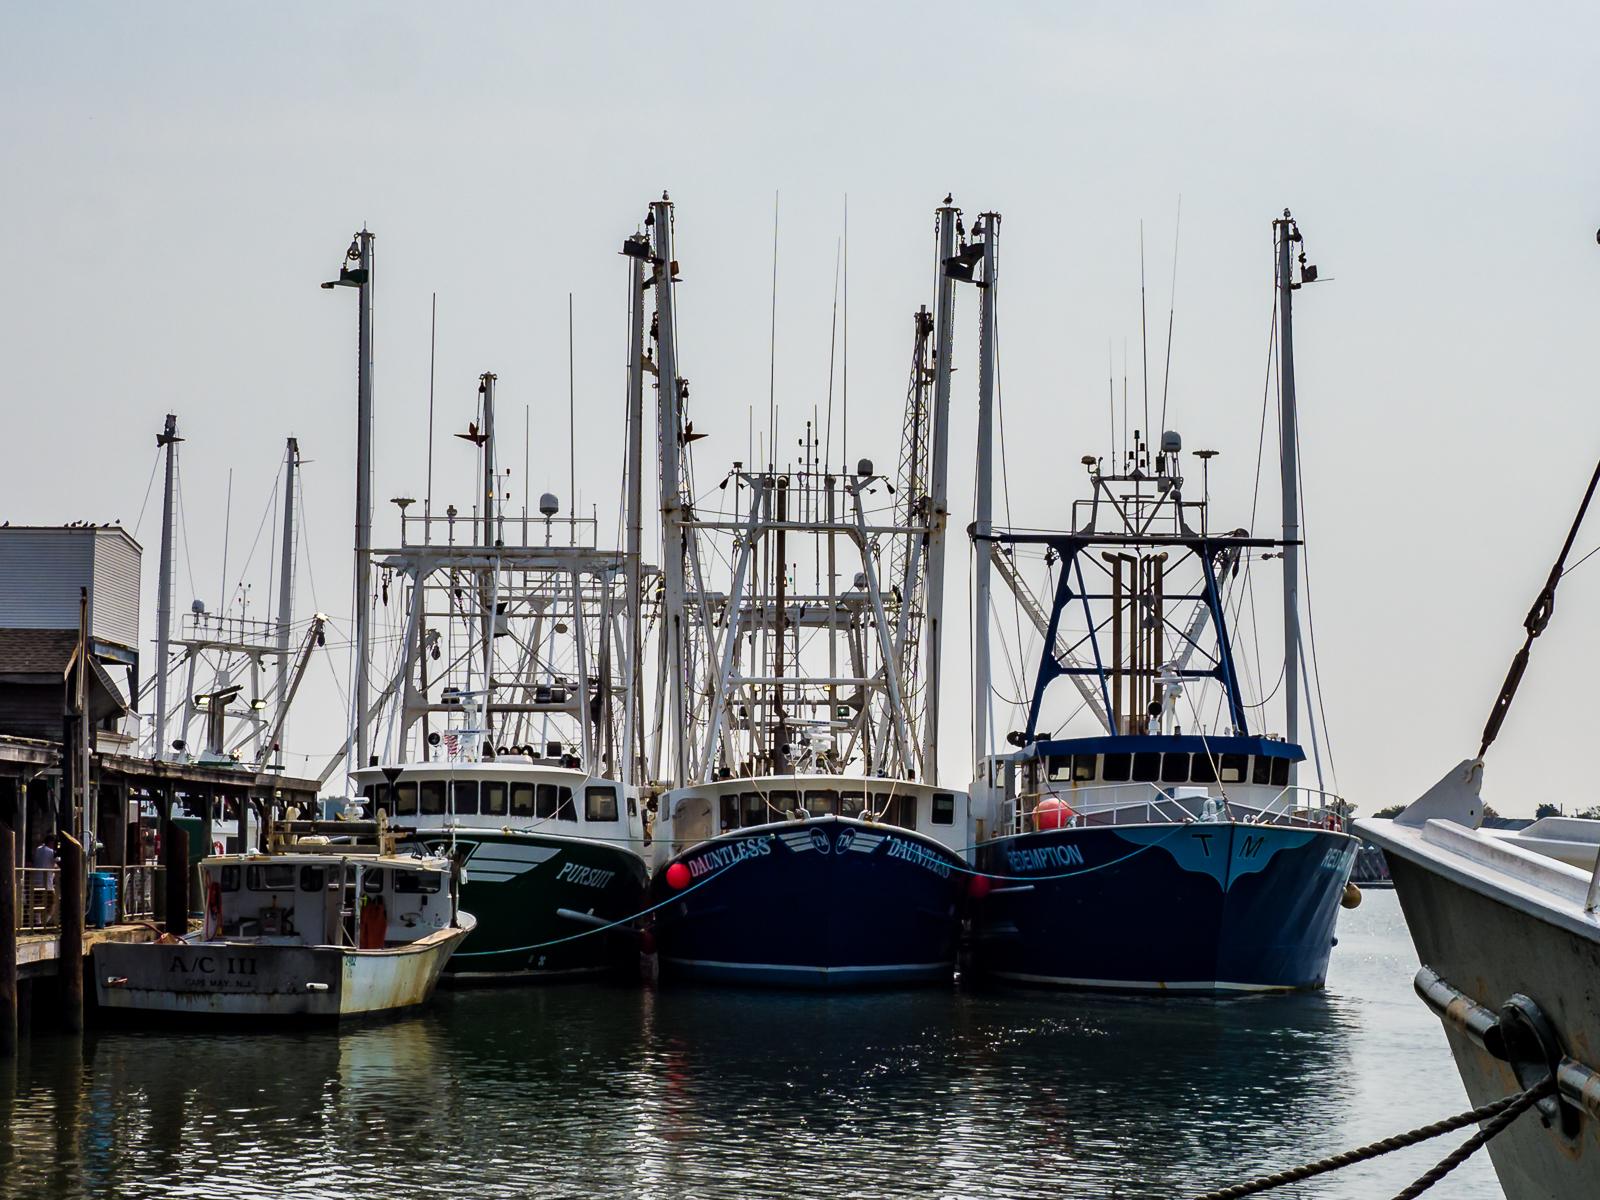 The fishing Fleet at Cape May